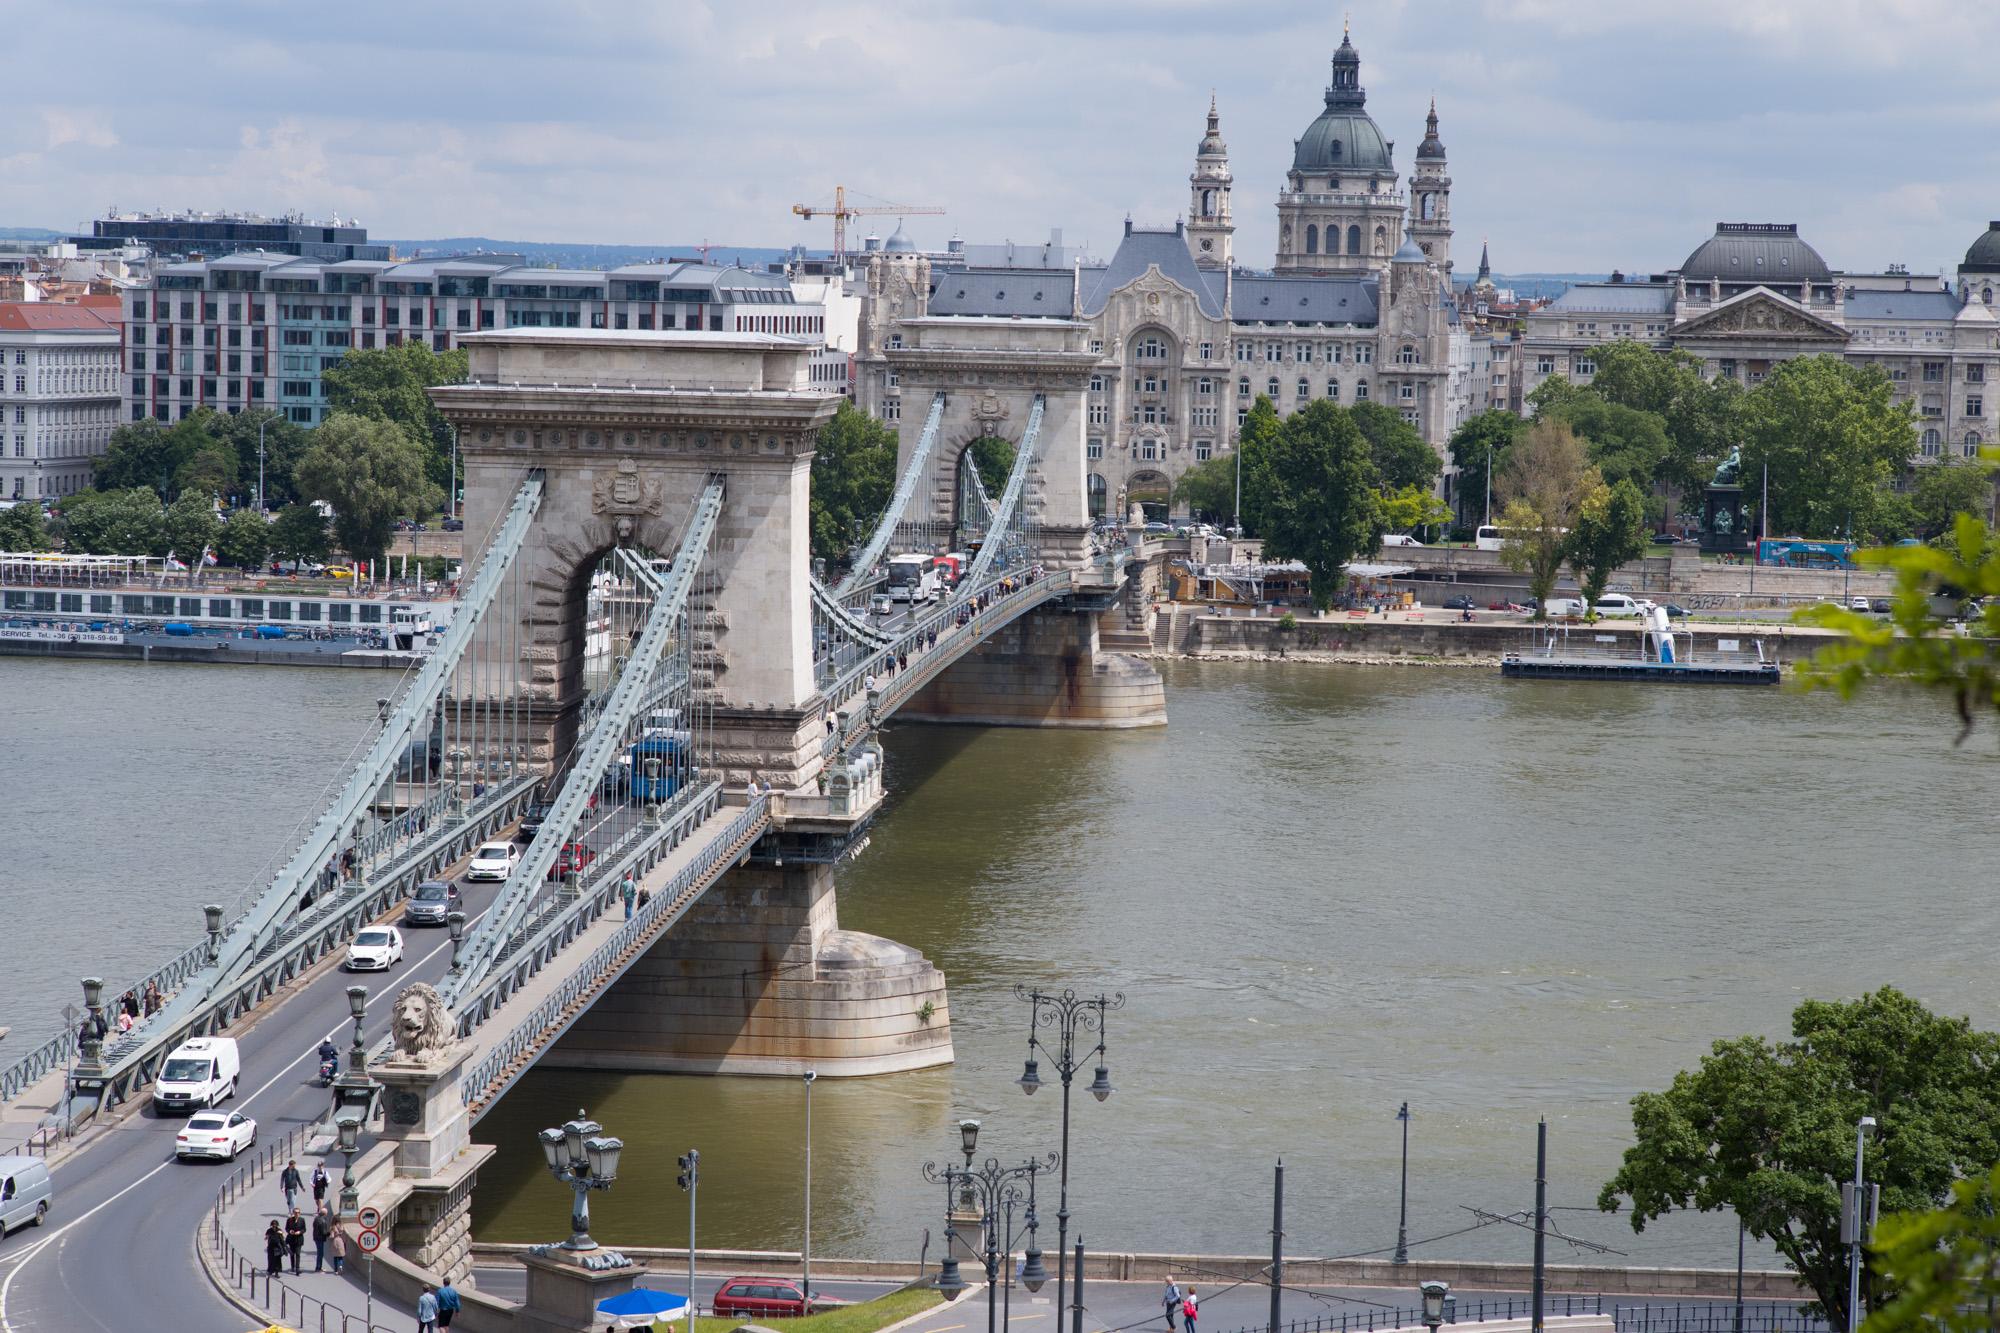 The Chain Bridge over the Danube in Budapest